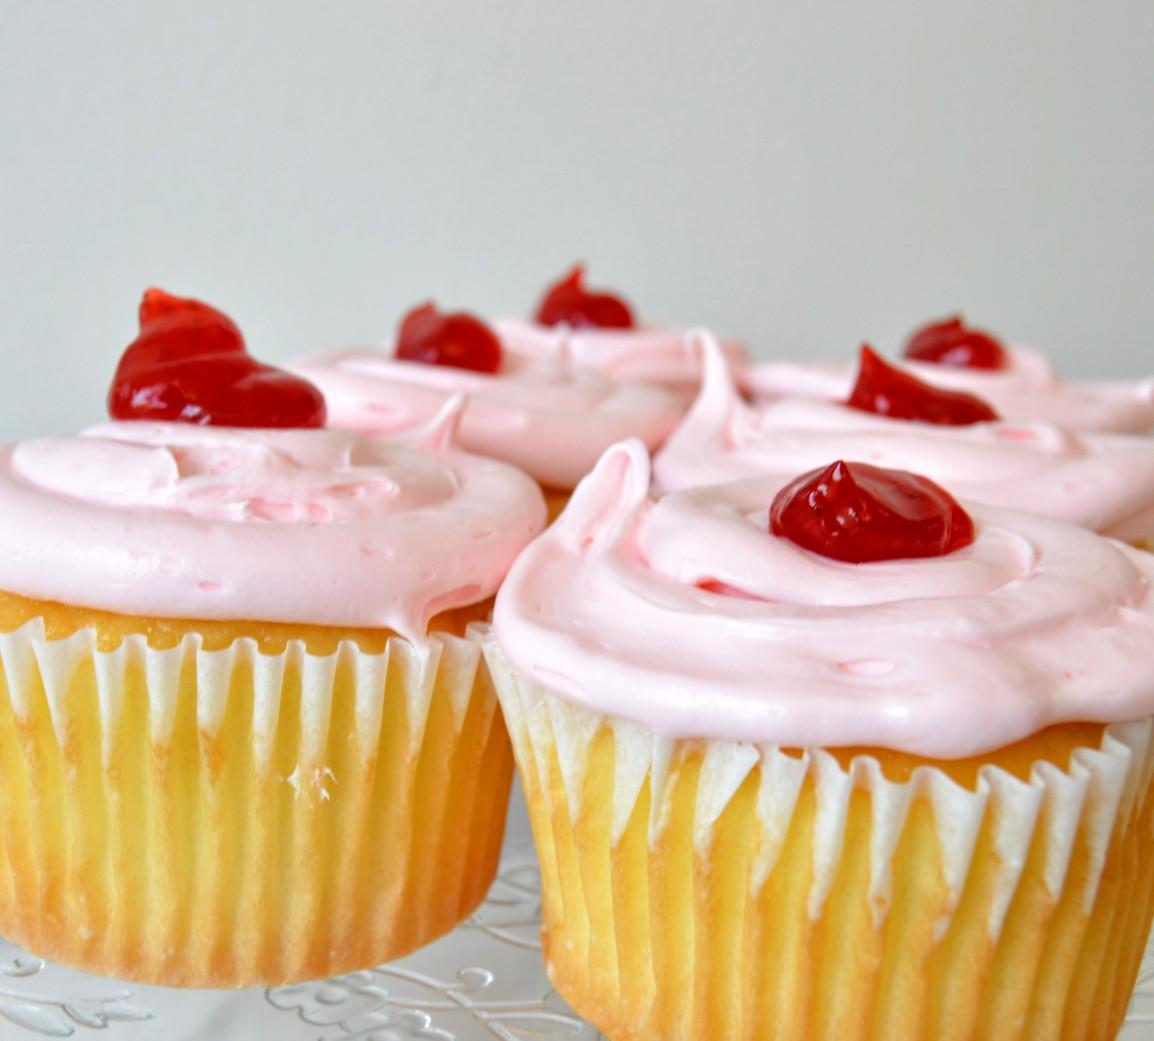 strawberry cupcakes by faronda davis